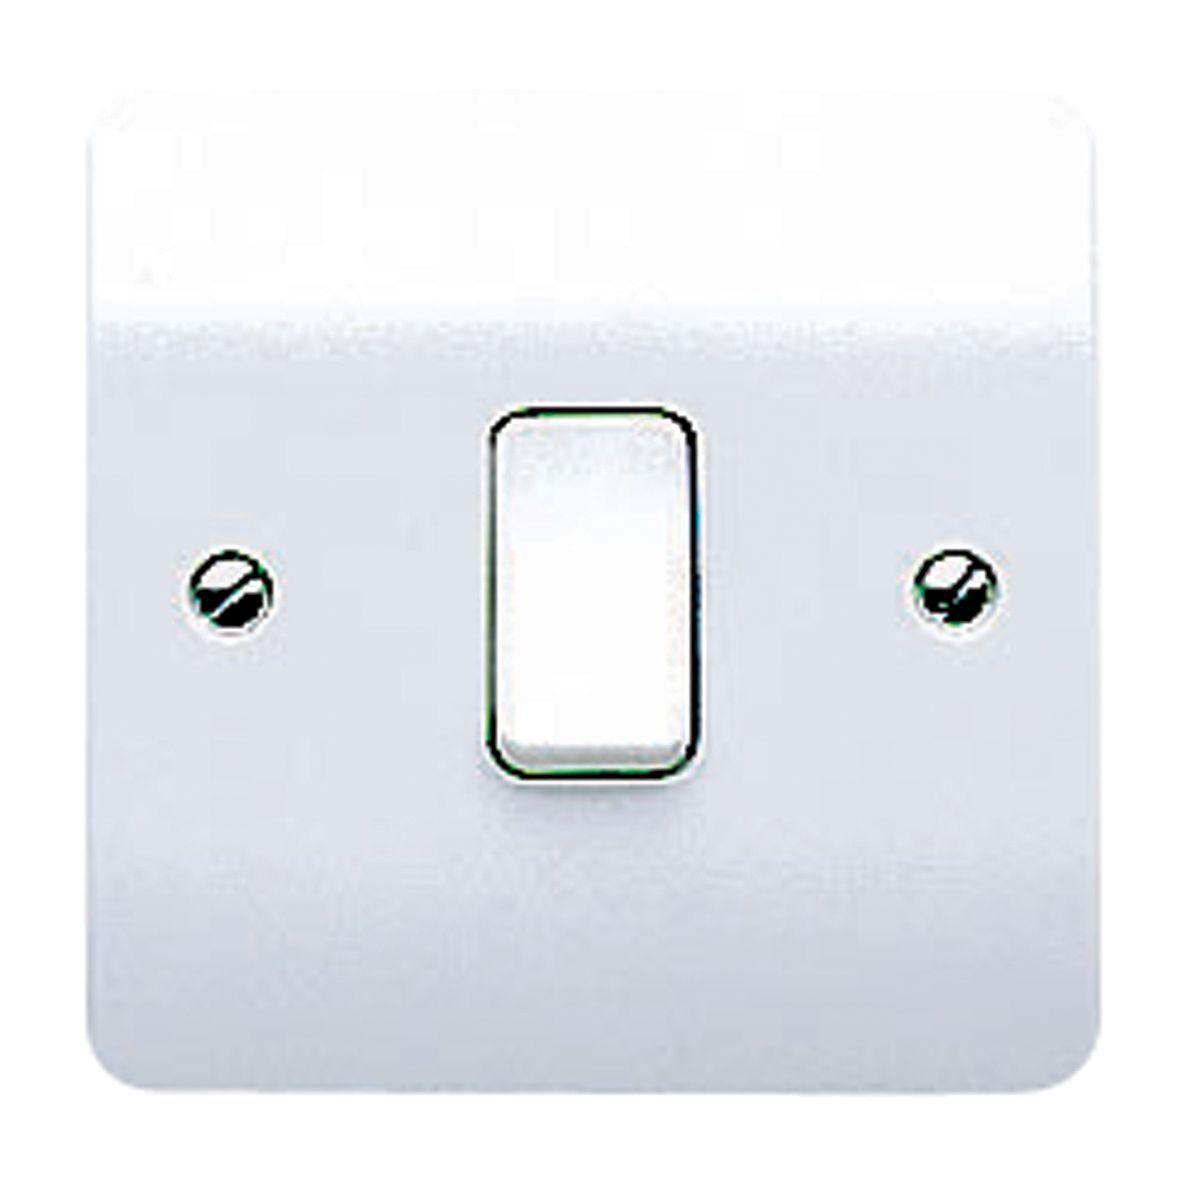 MK 10A 2-Way Single White Gloss Intermediate Switch | Departments ...